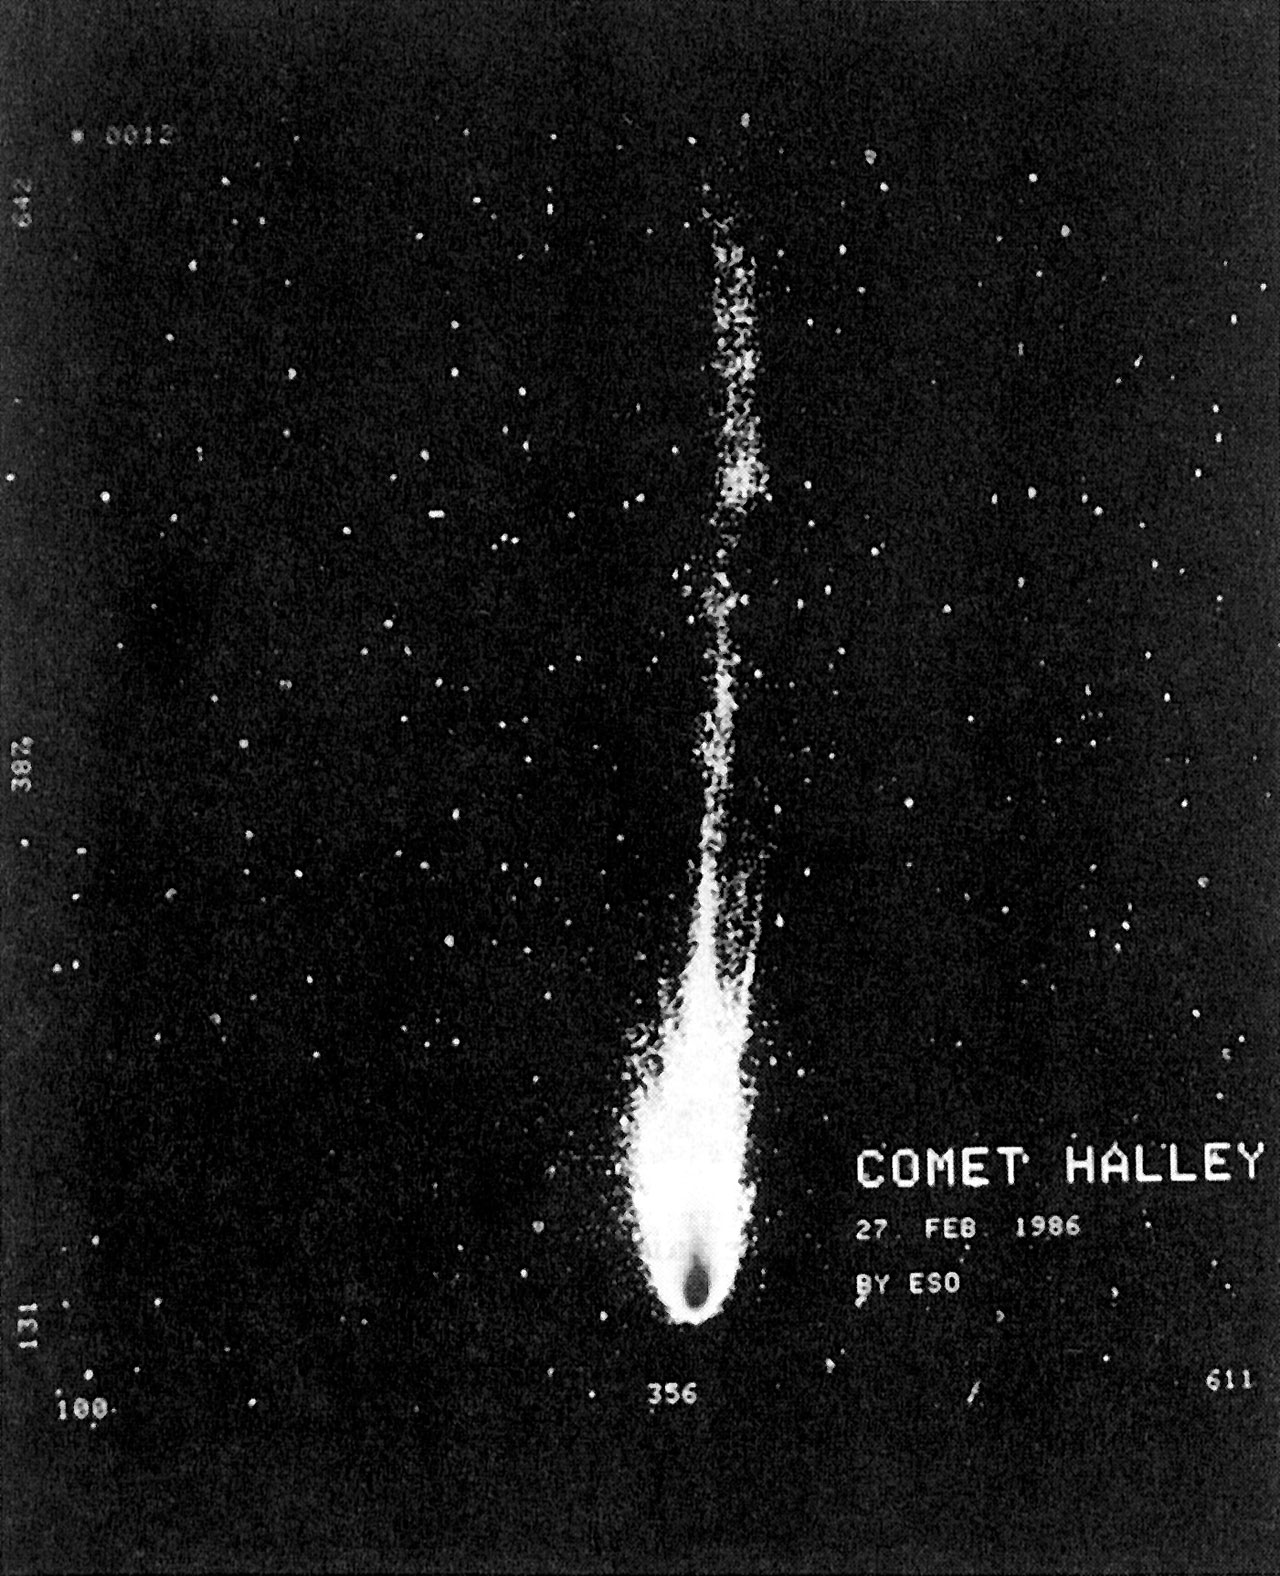 Comet Halley develops 15-degree tail